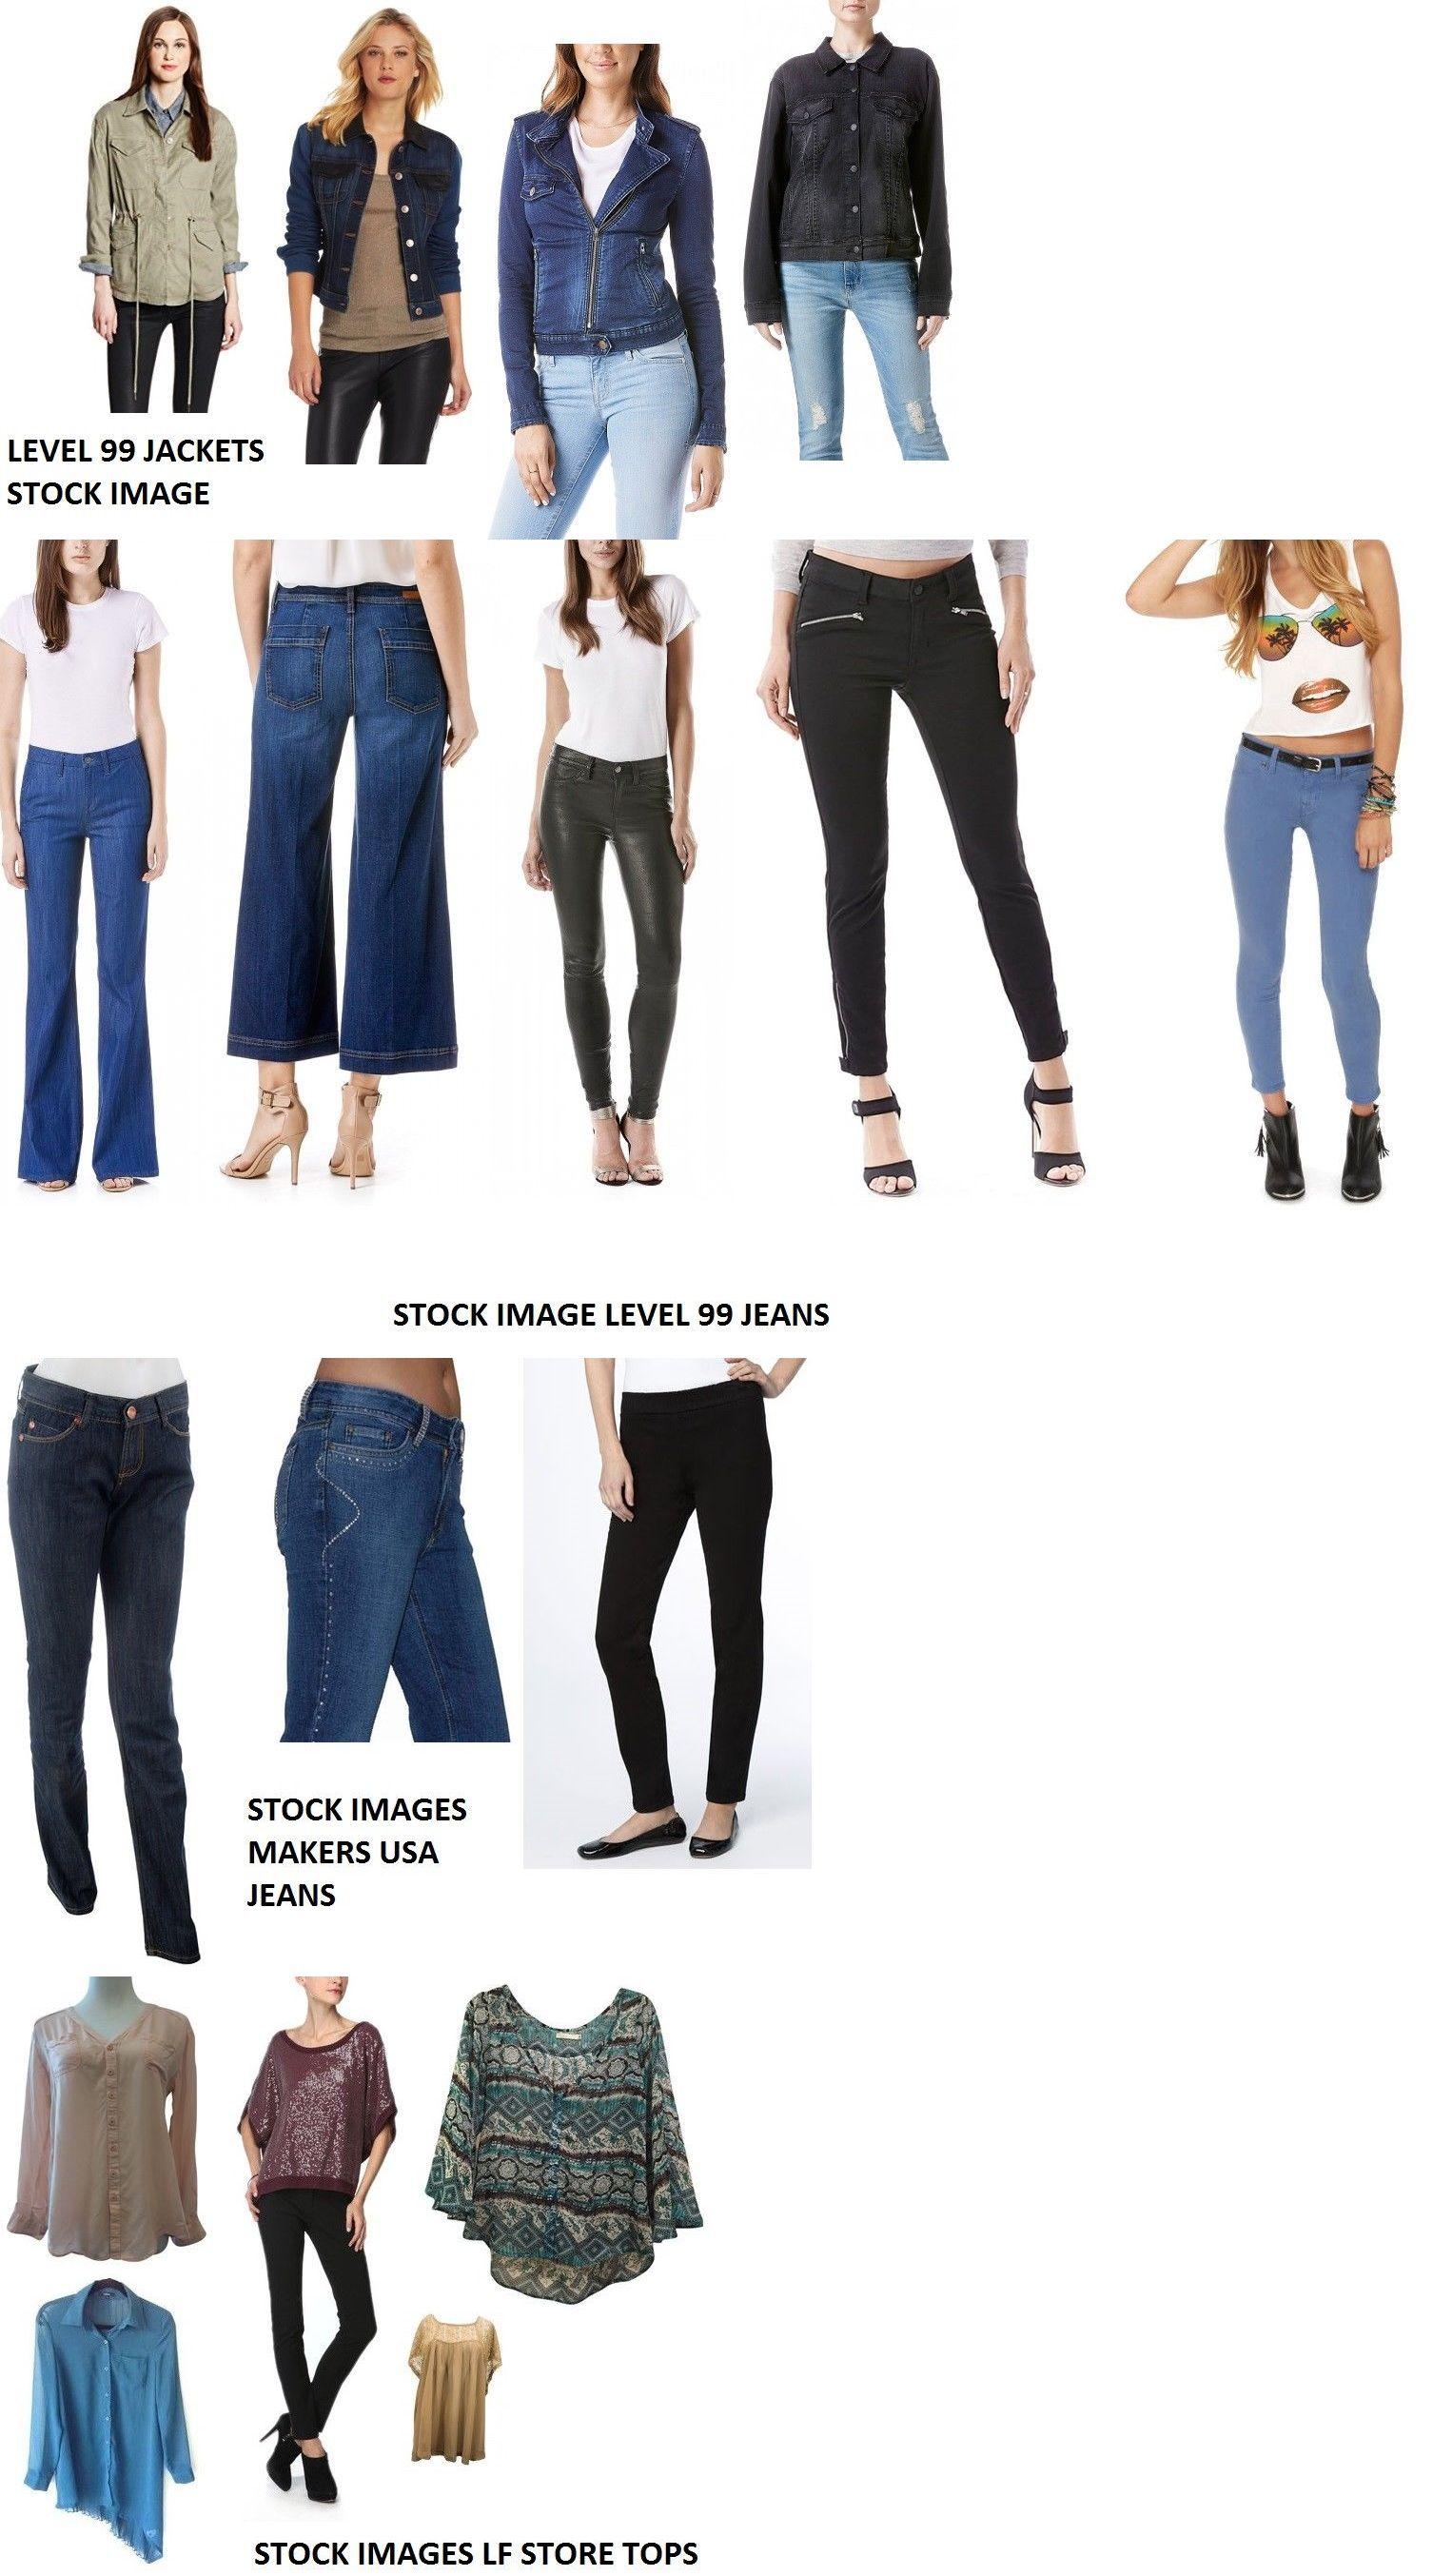 Wholesale Designer Clothing Lots   Mixed Lots 45057 3000 New Wholesale Lot Resale Womens Designer